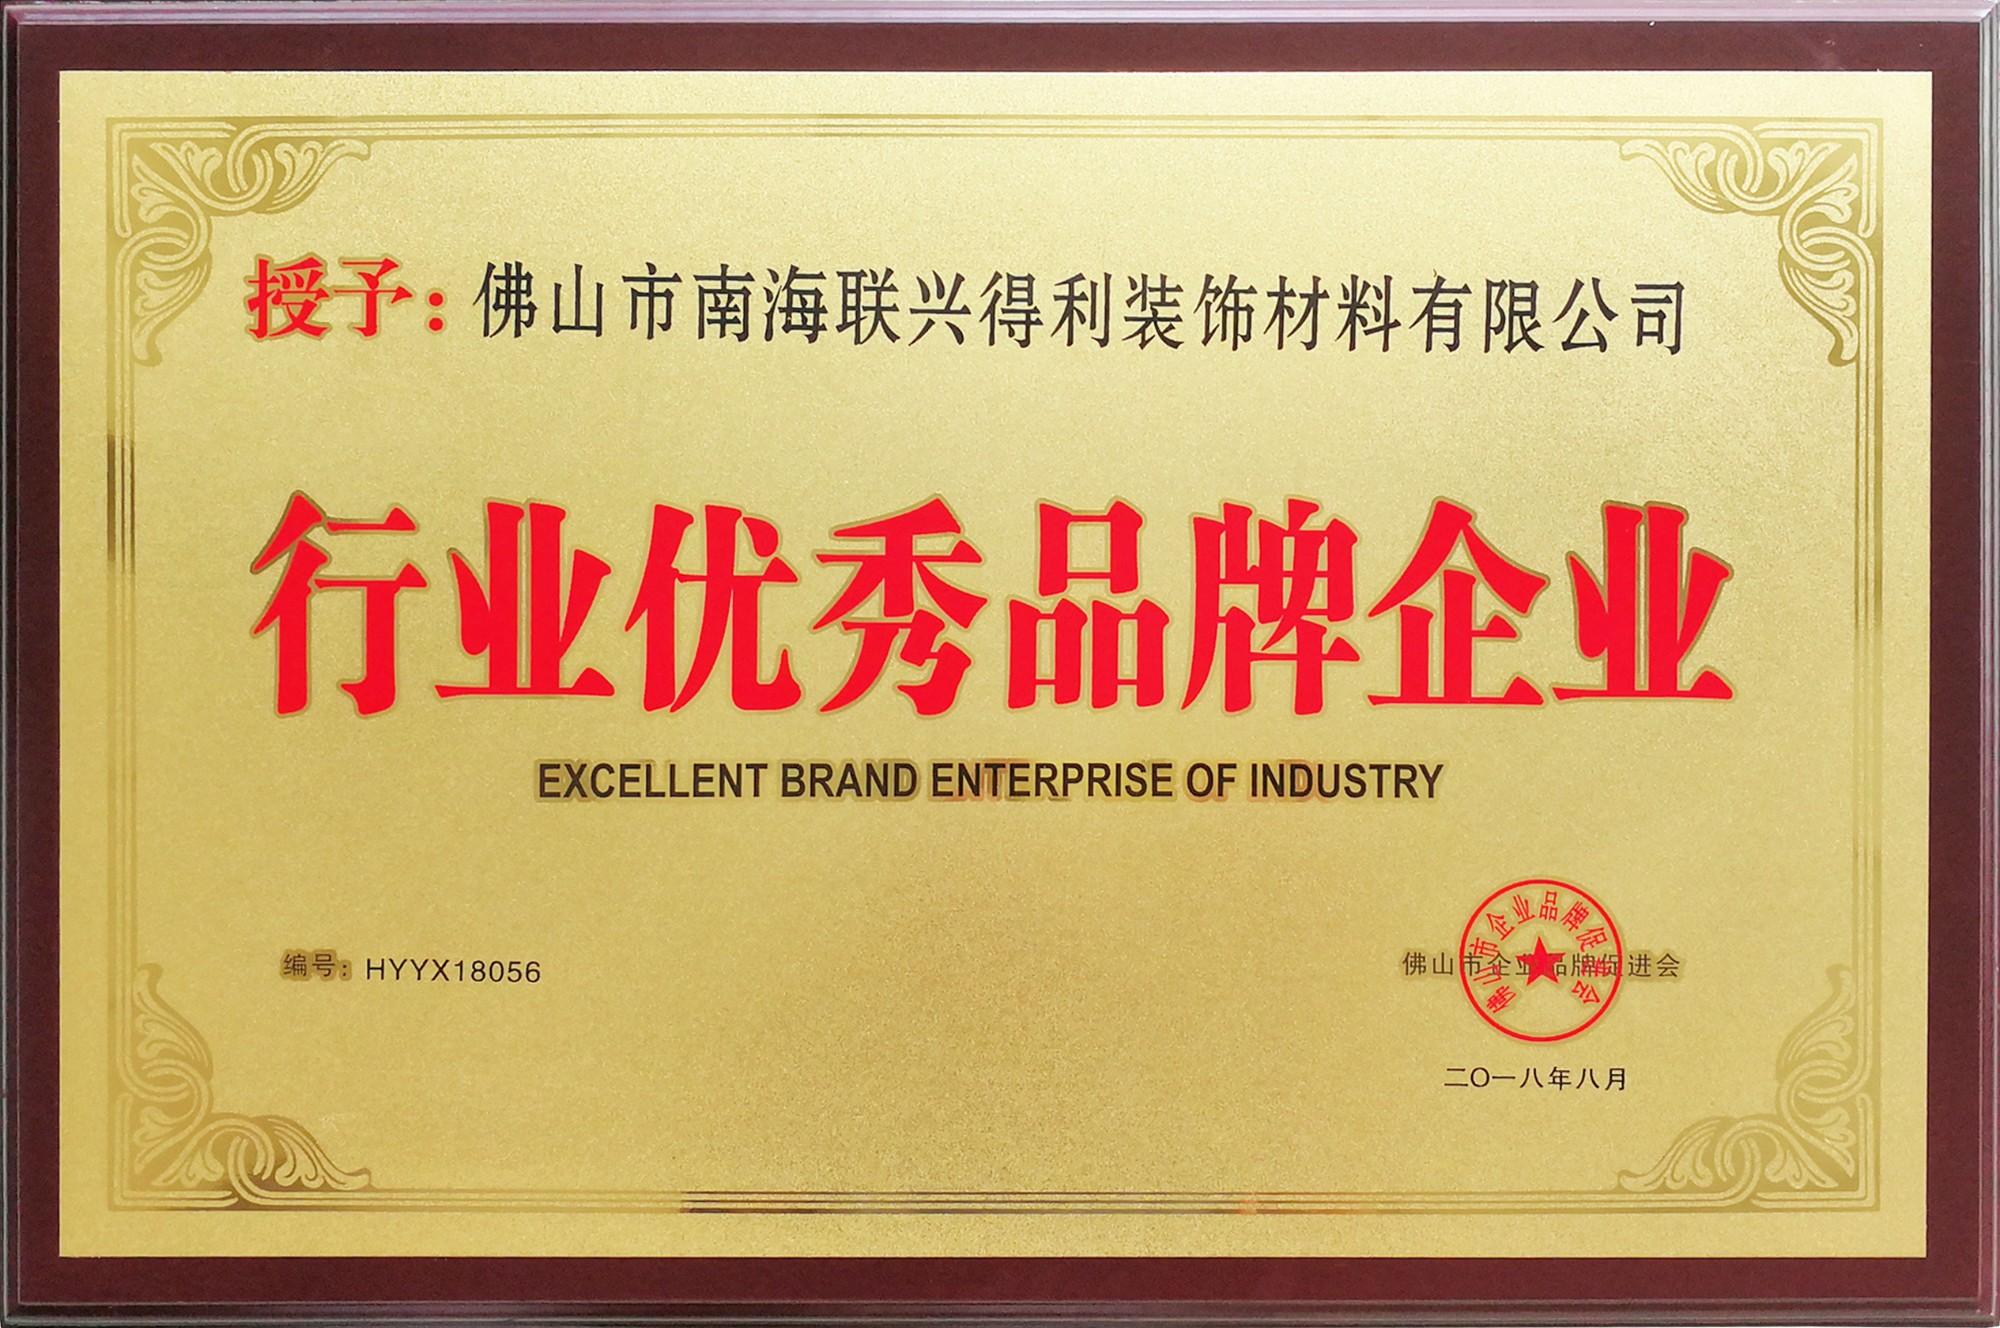 Excellent Brand Enterprise of Industry